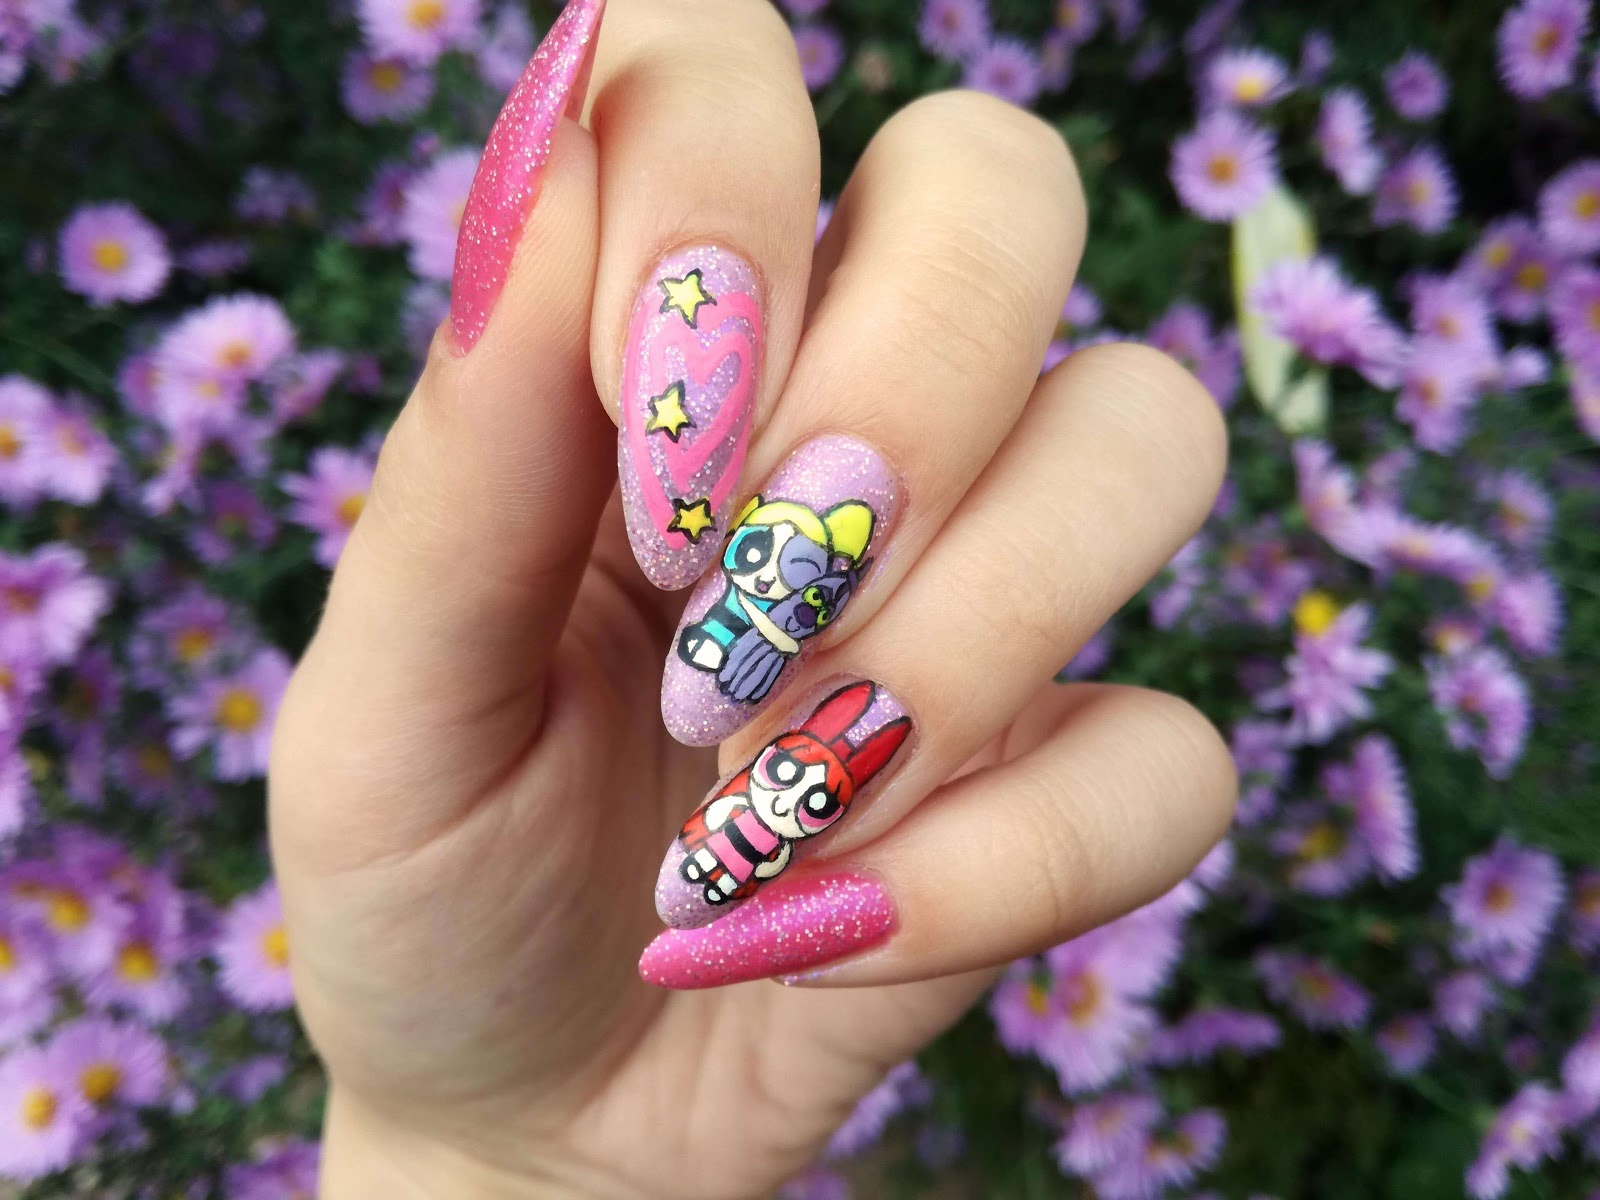 Atomówki na paznokciach